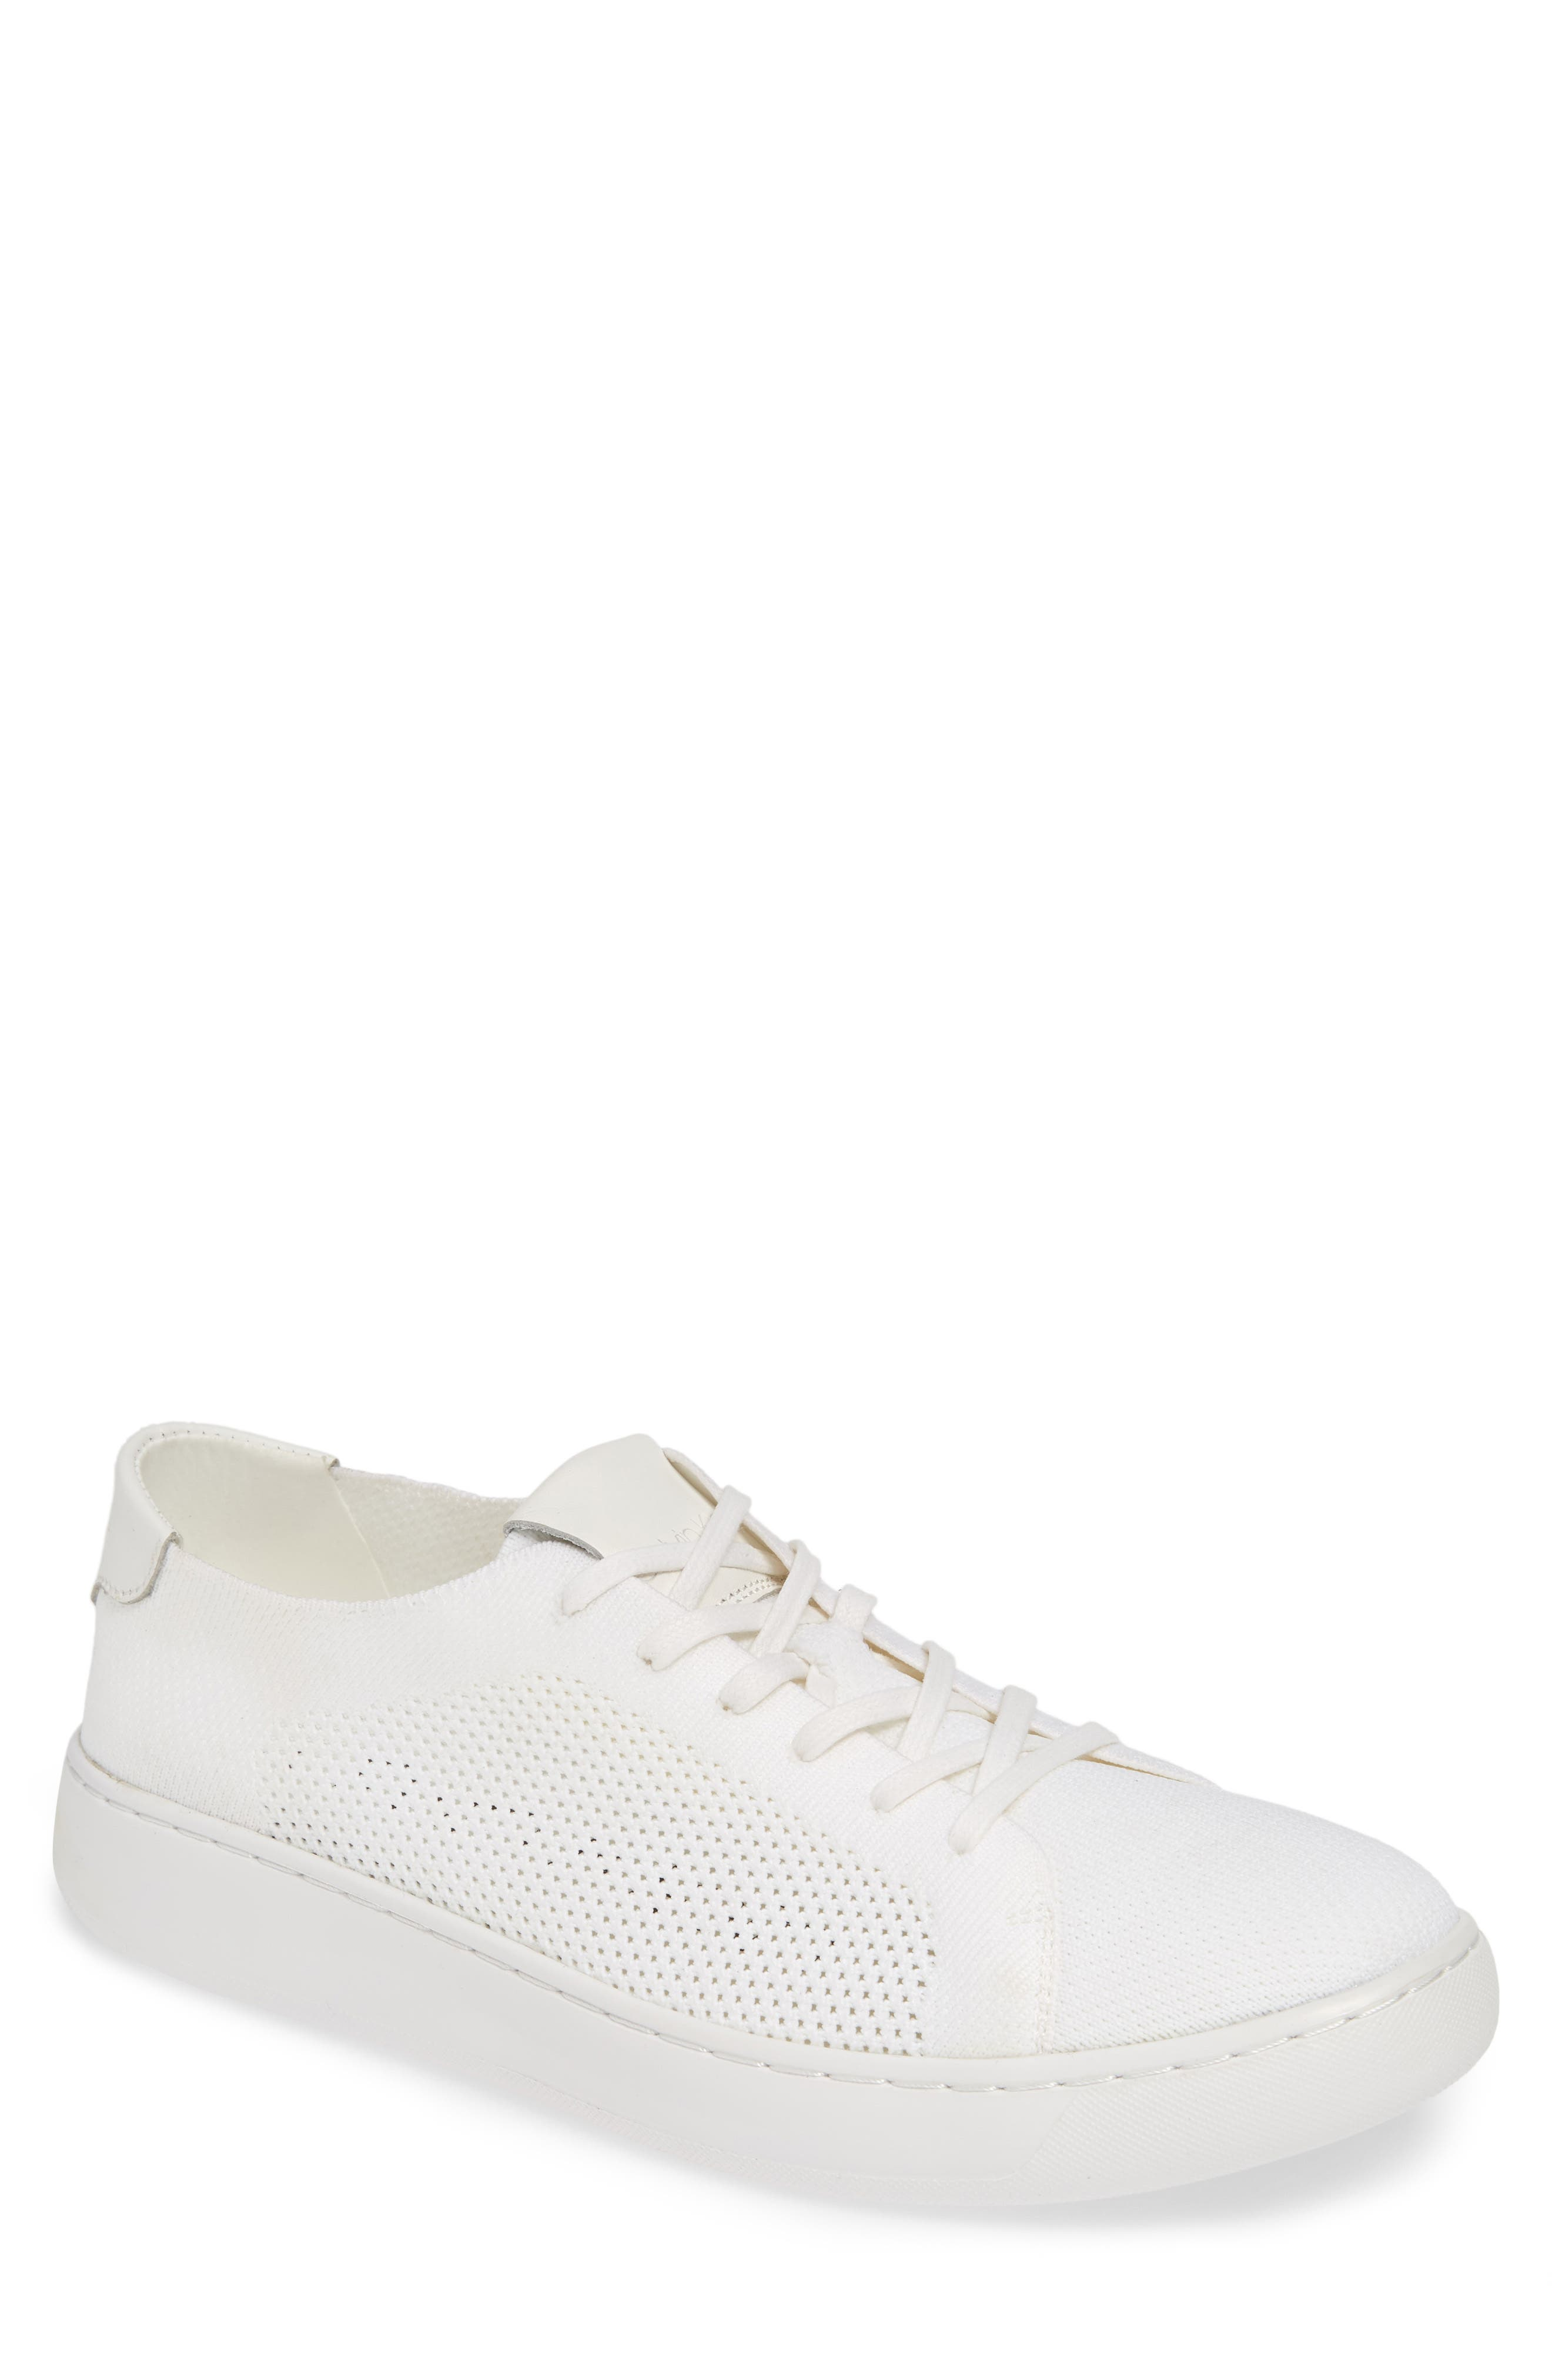 CALVIN KLEIN, Freeport Sneaker, Main thumbnail 1, color, WHITE